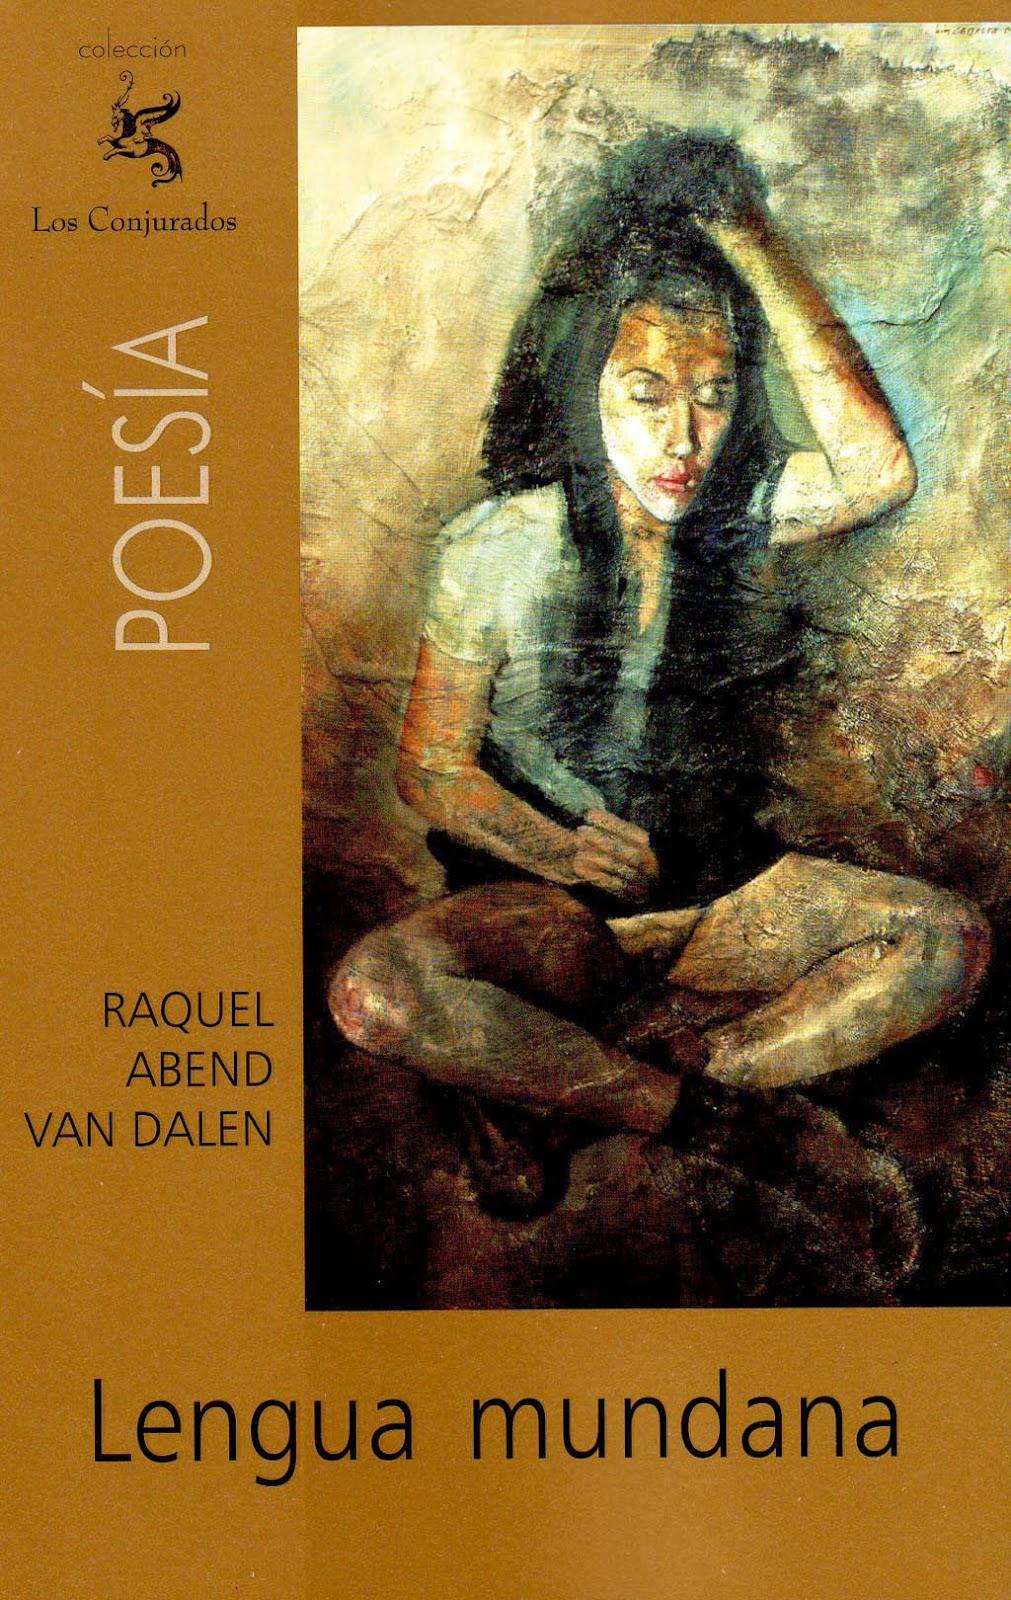 Lengua mundana - Raquel Abend Van Dalen